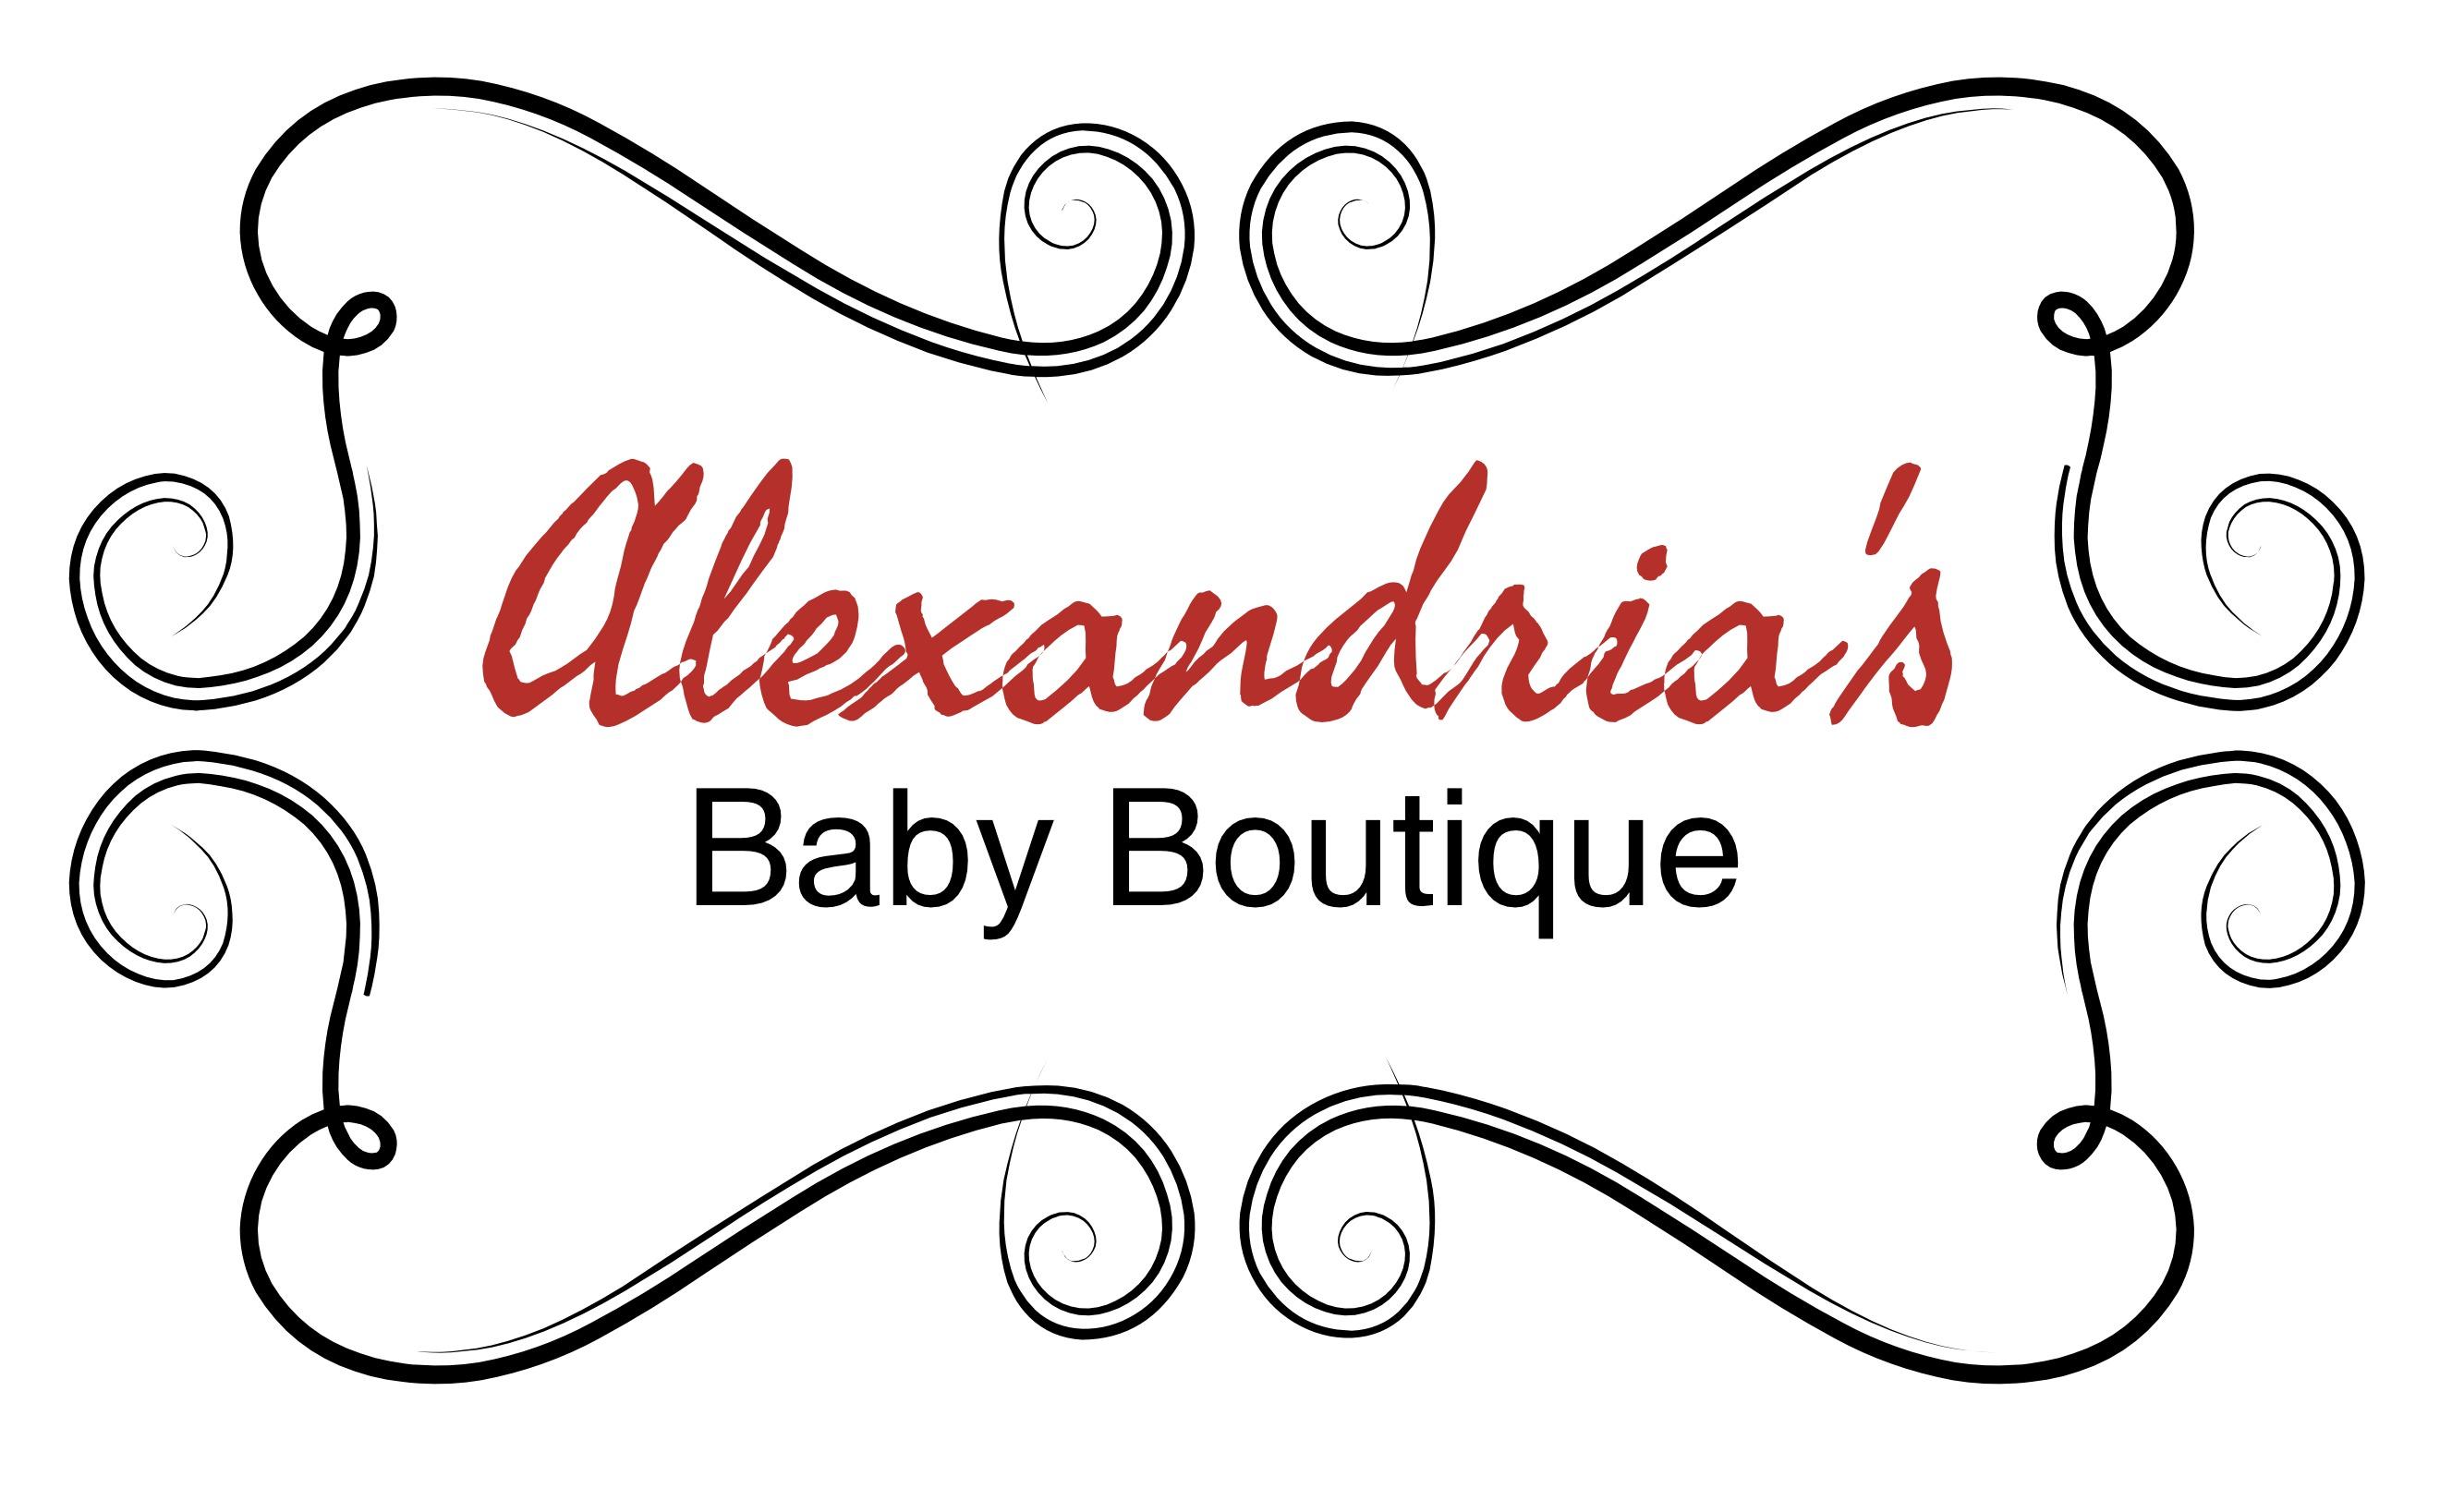 Alexandria's Baby Boutique LTD's logo